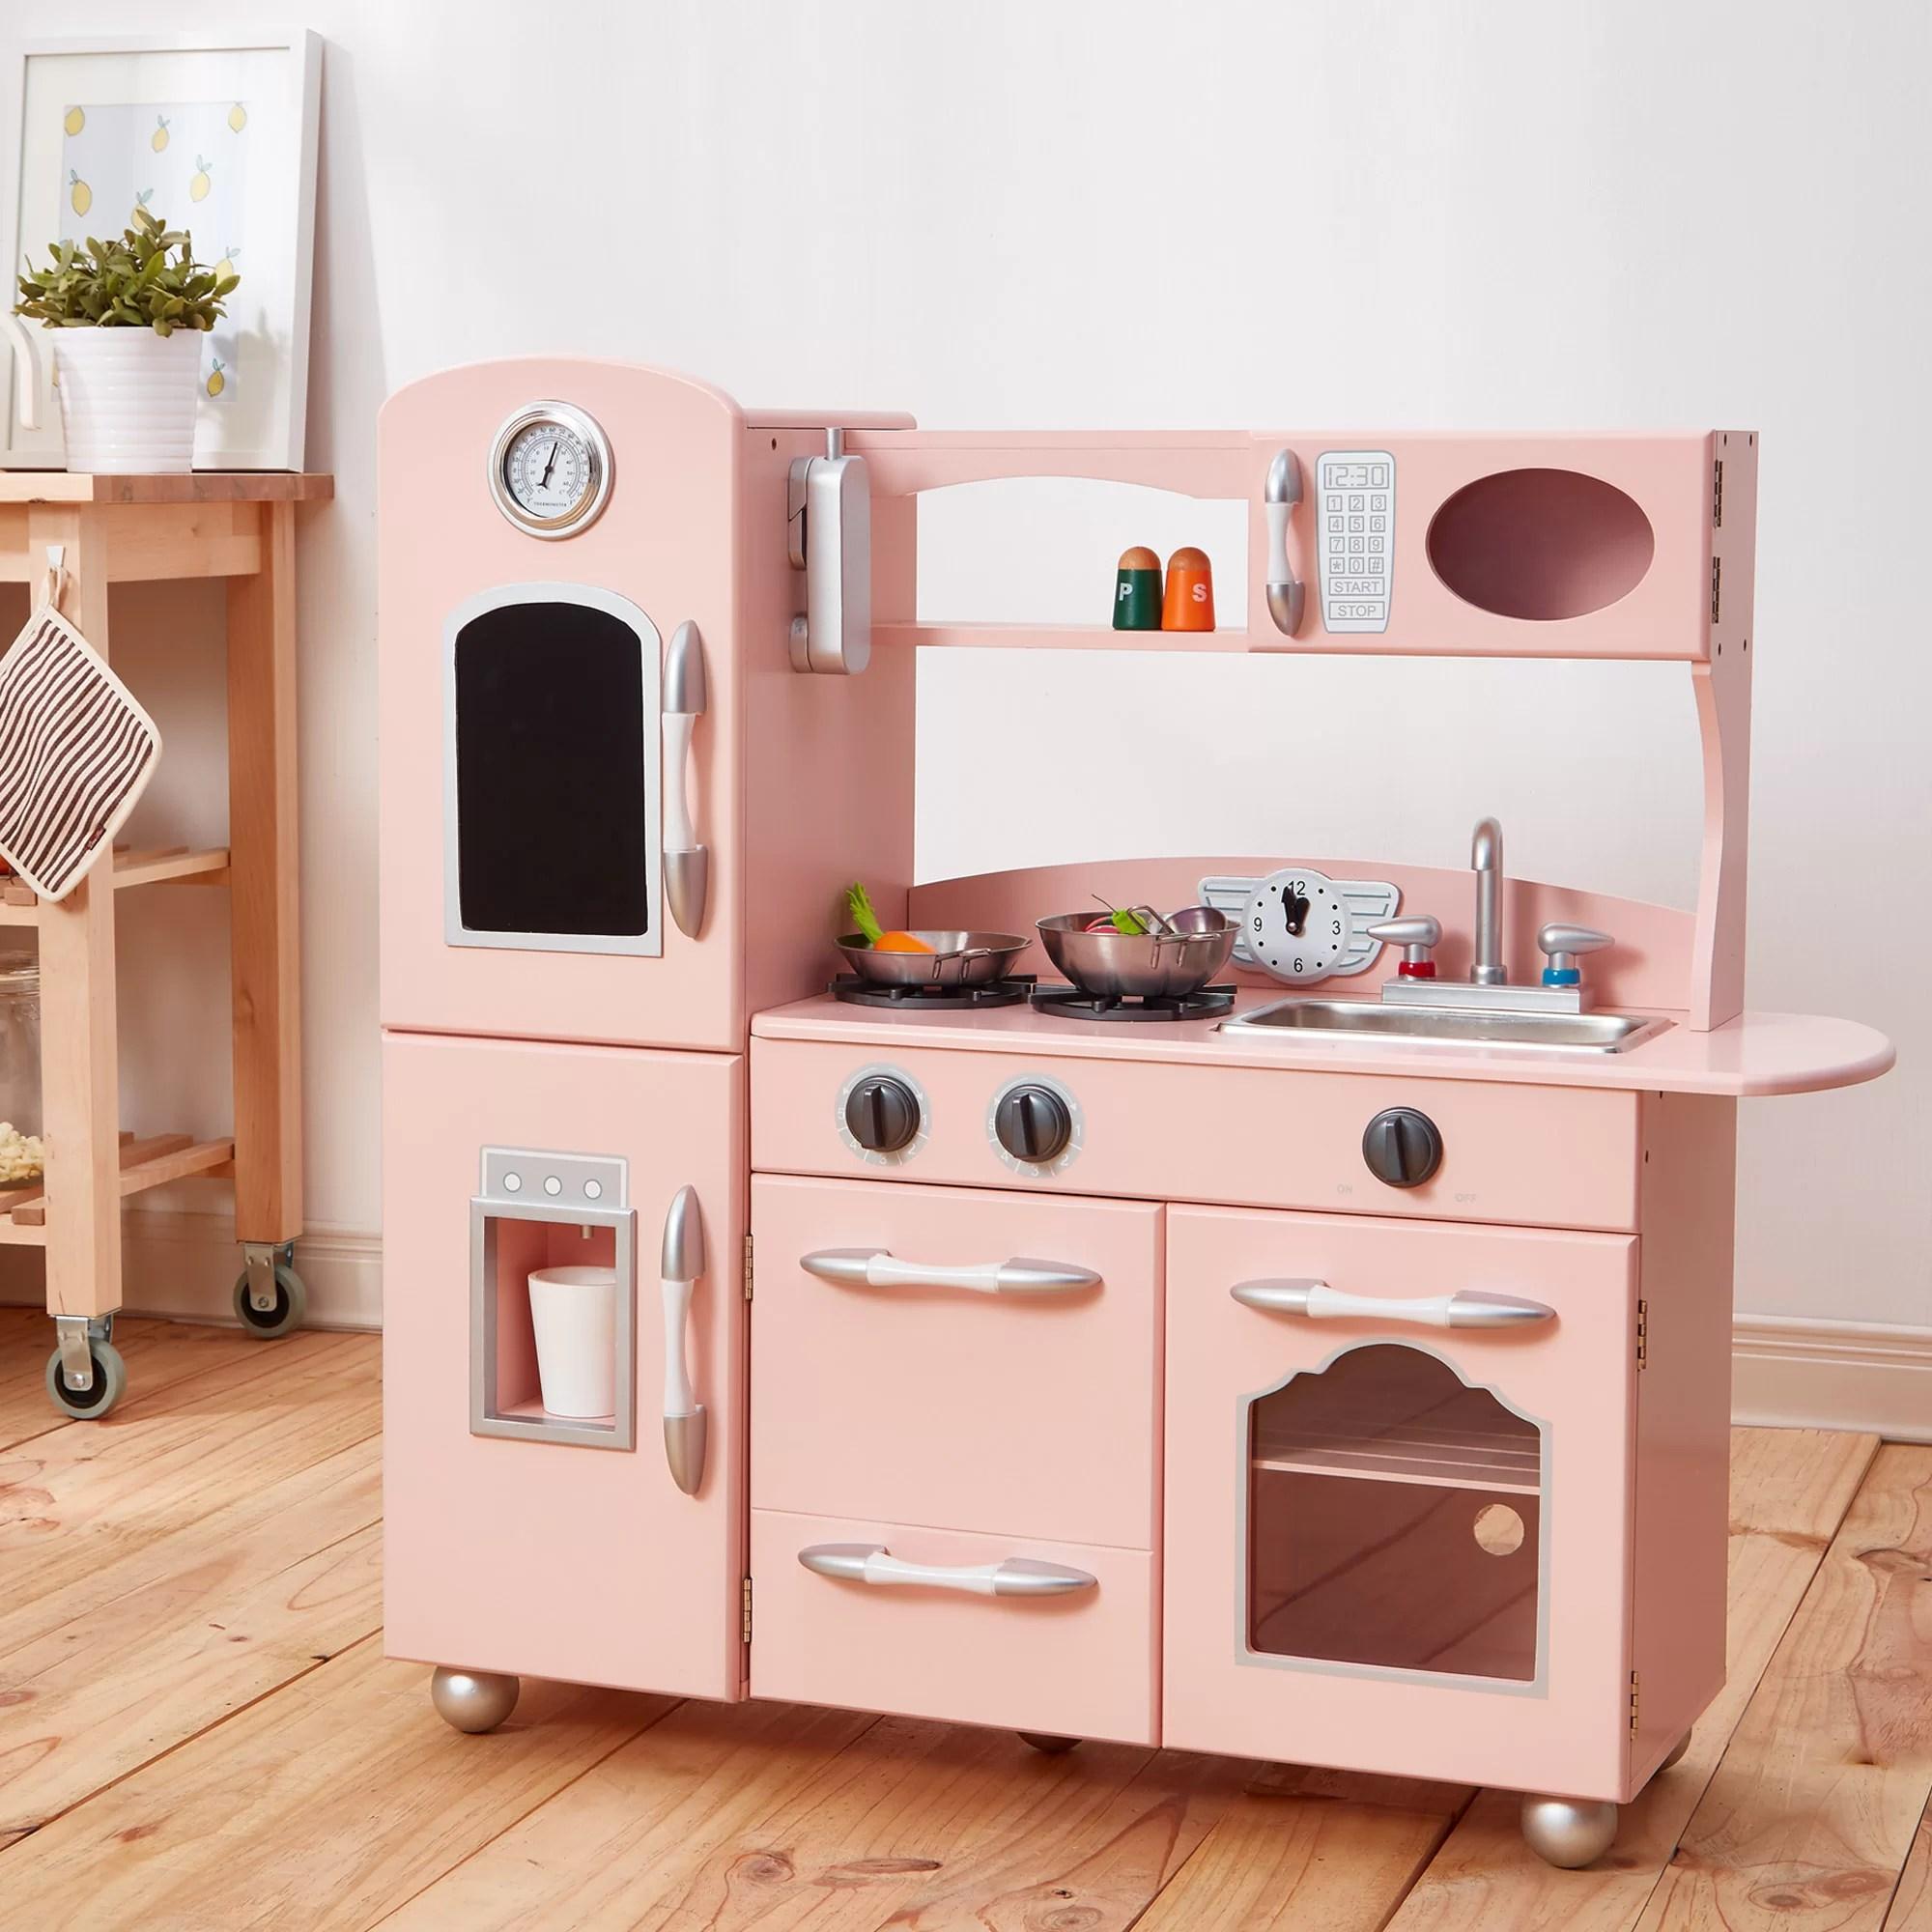 wood kitchen set outdoor design teamson kids reviews wayfair co uk